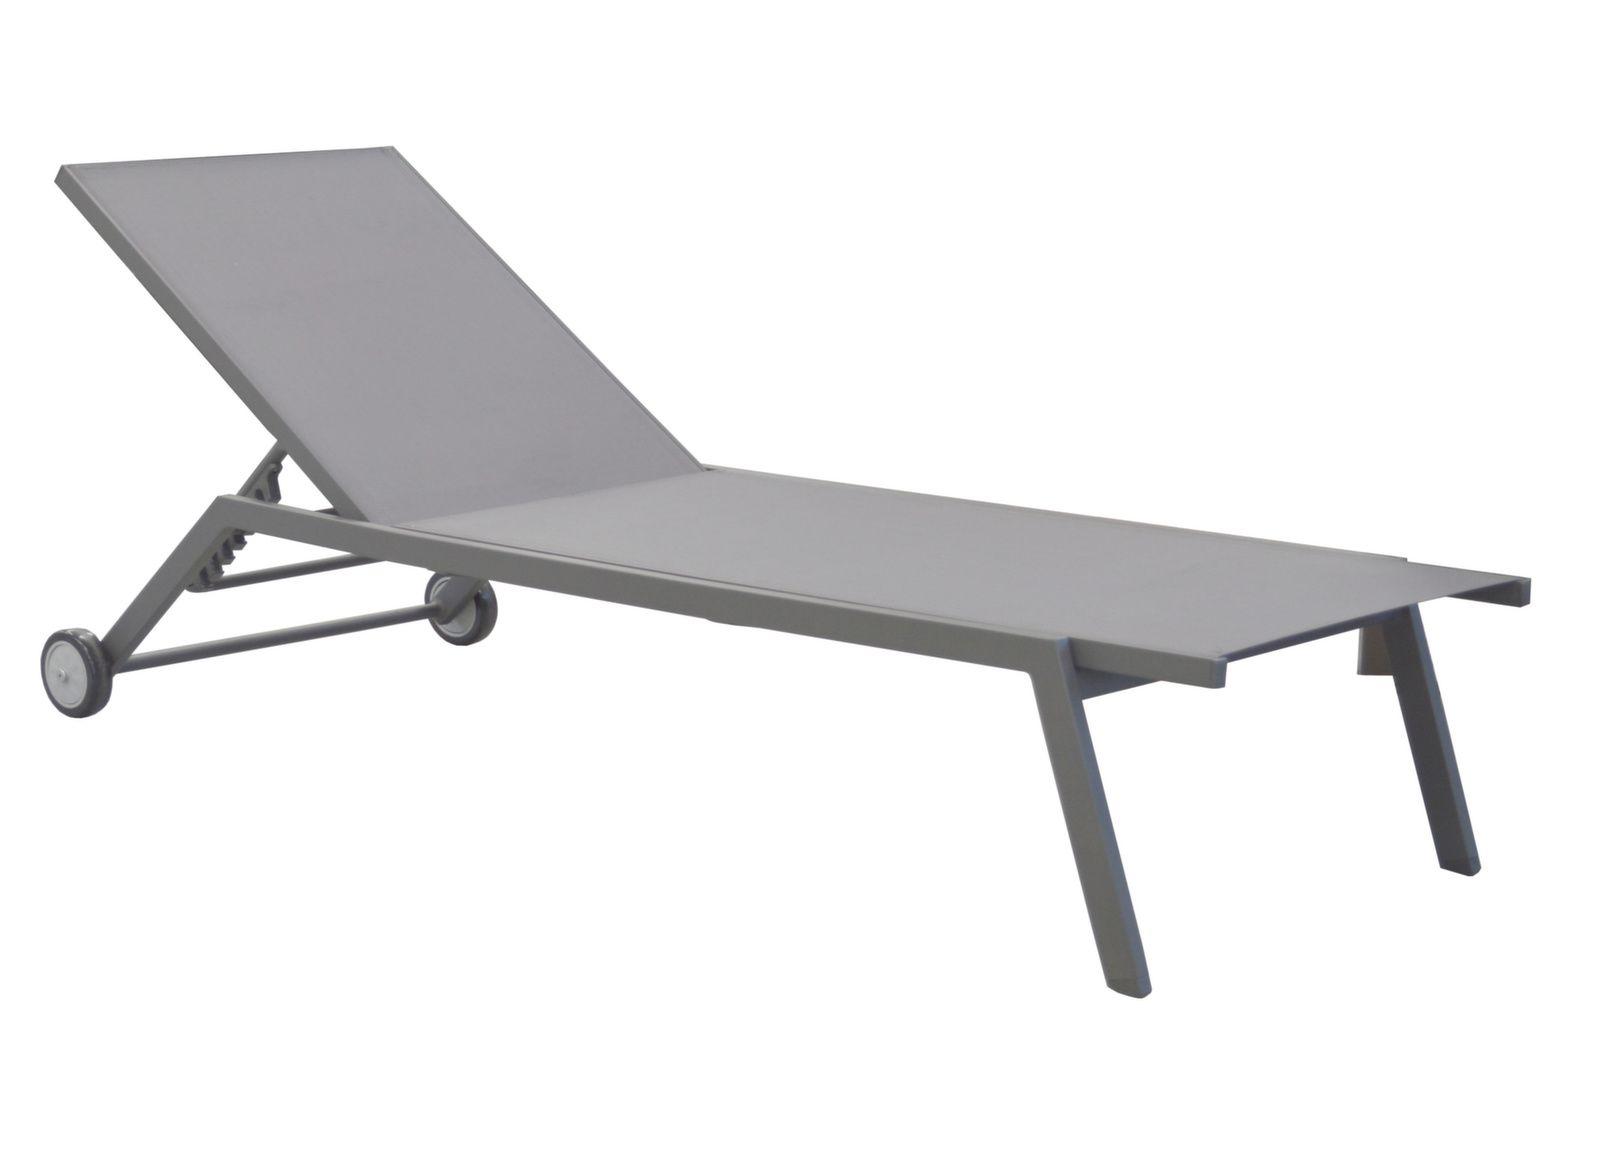 lit de soleil florence proloisirs mobilier de jardin. Black Bedroom Furniture Sets. Home Design Ideas